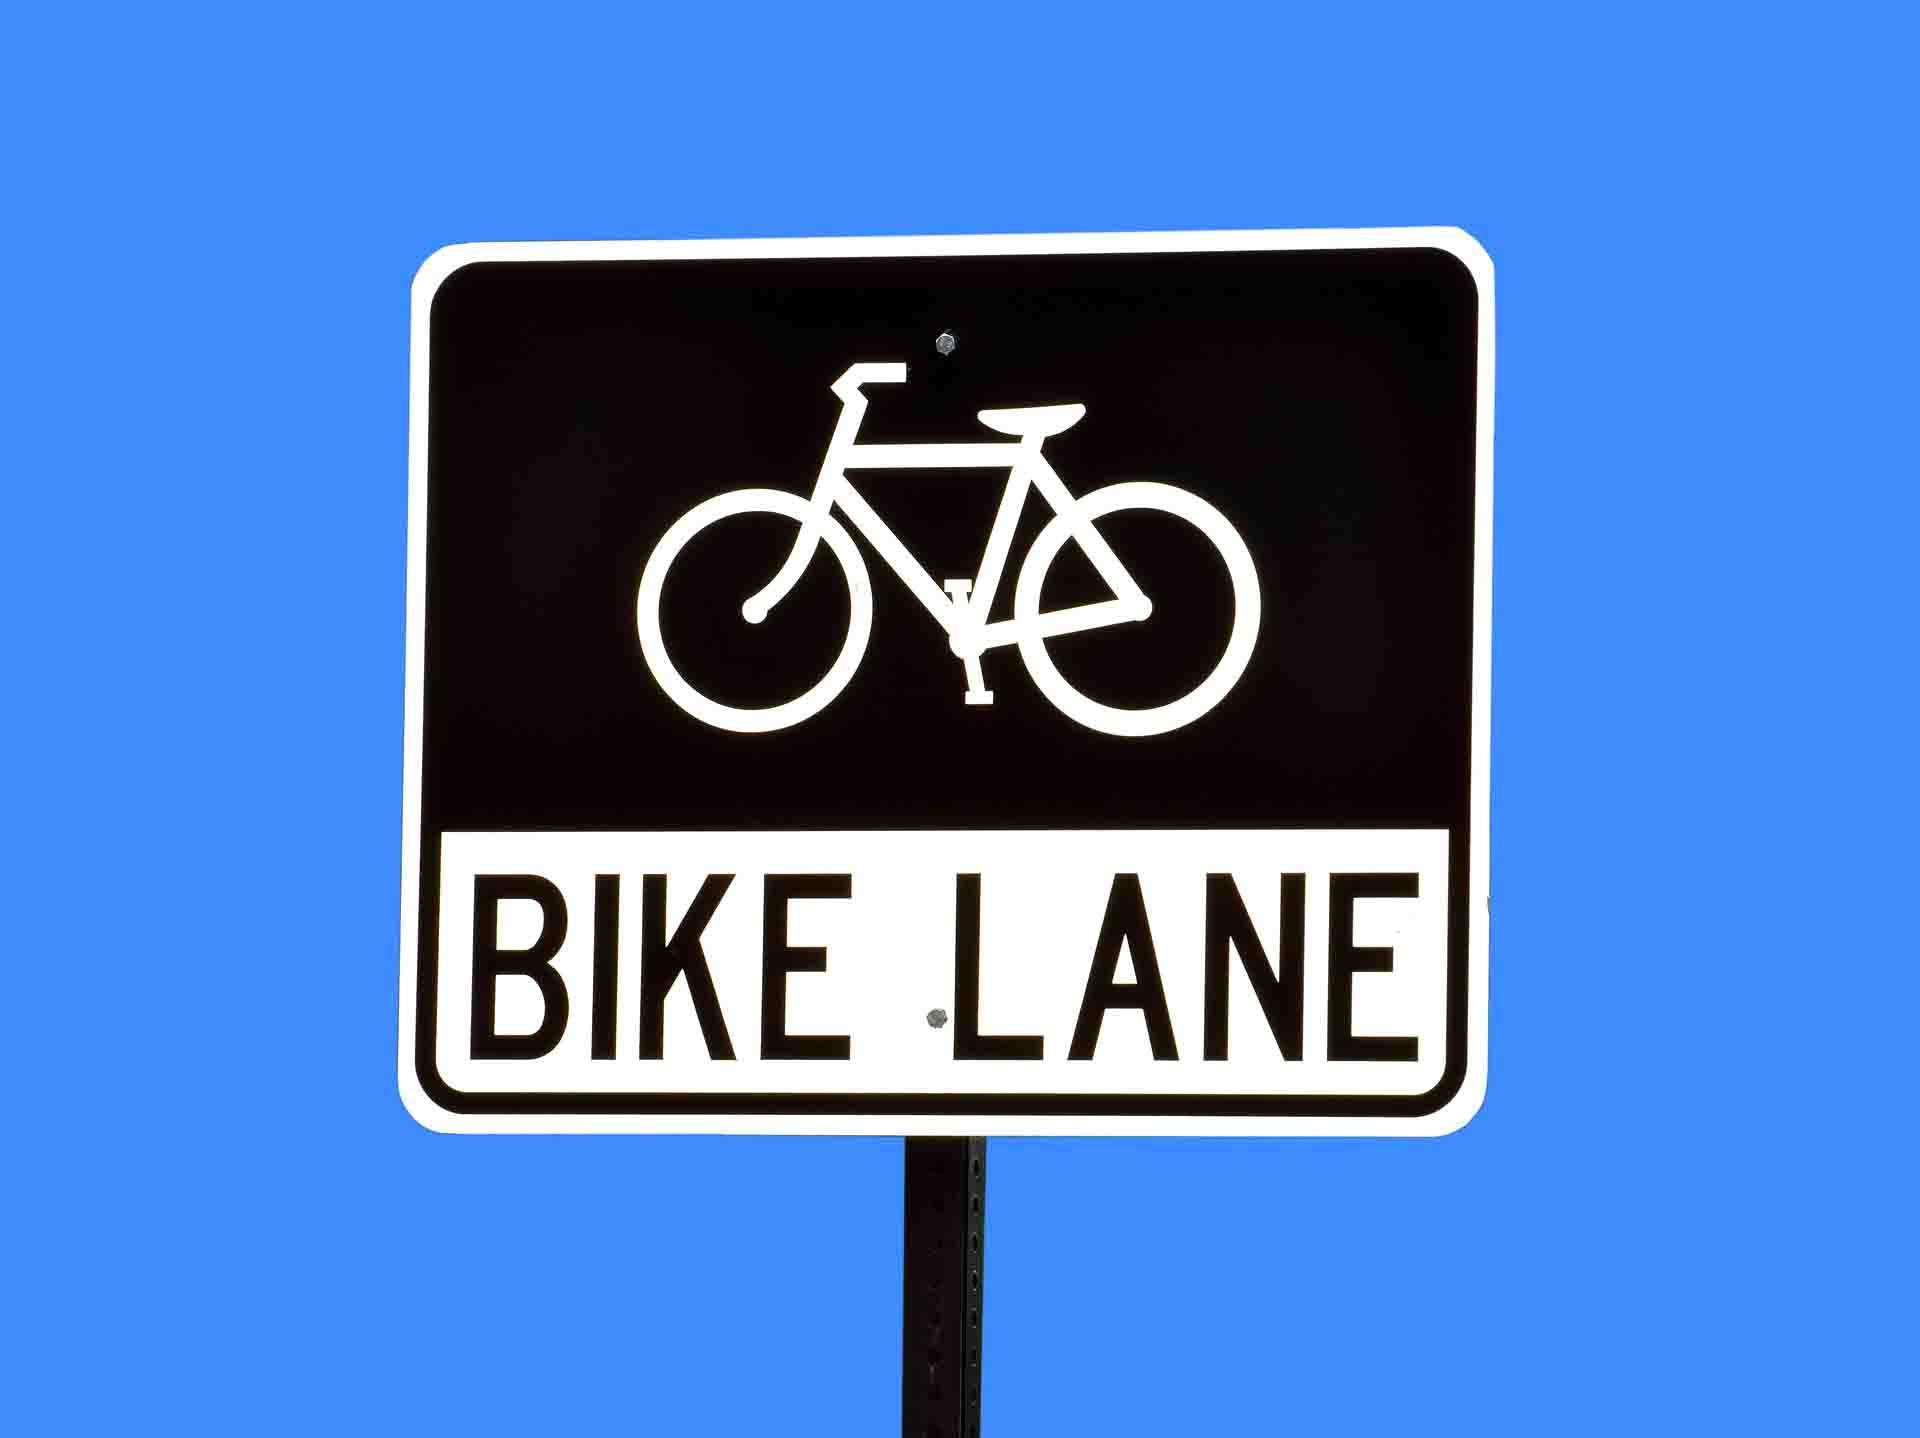 Una señal de carril bici en inglés